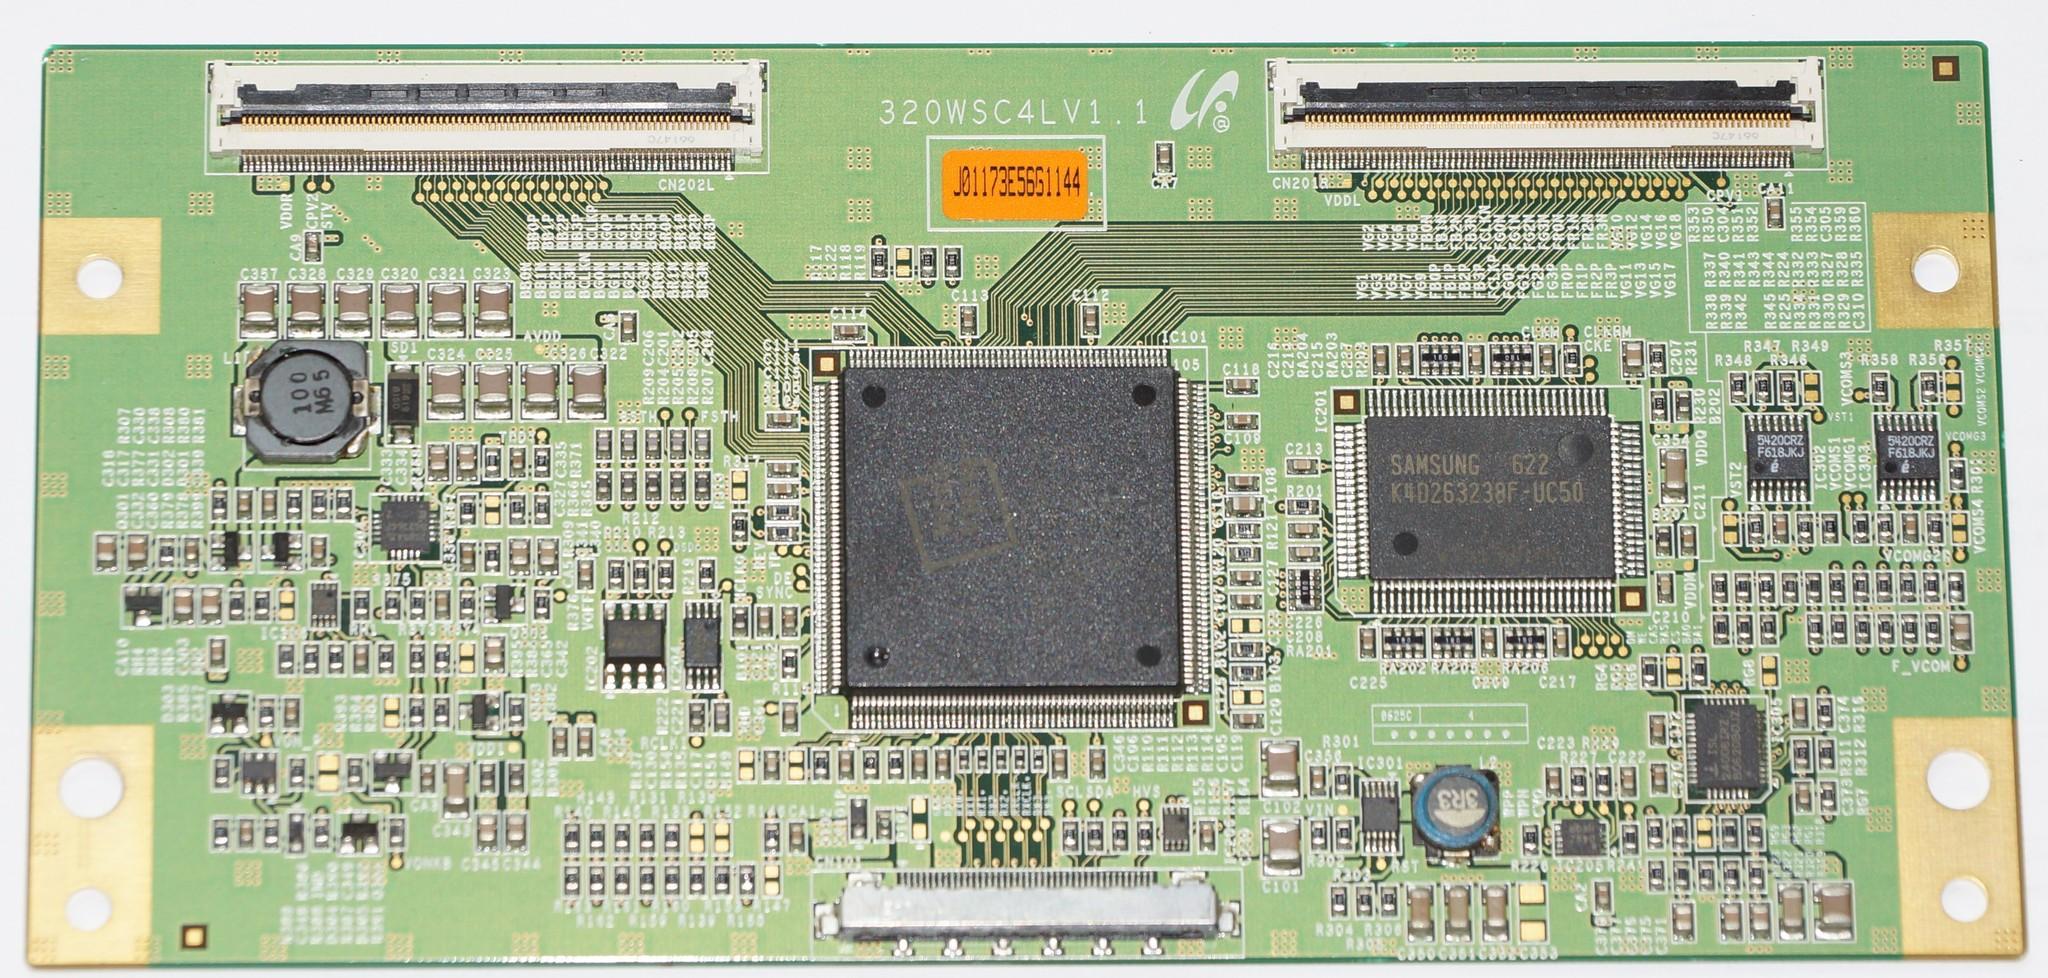 320WSC4LV1.1 t-con телевизора Sony